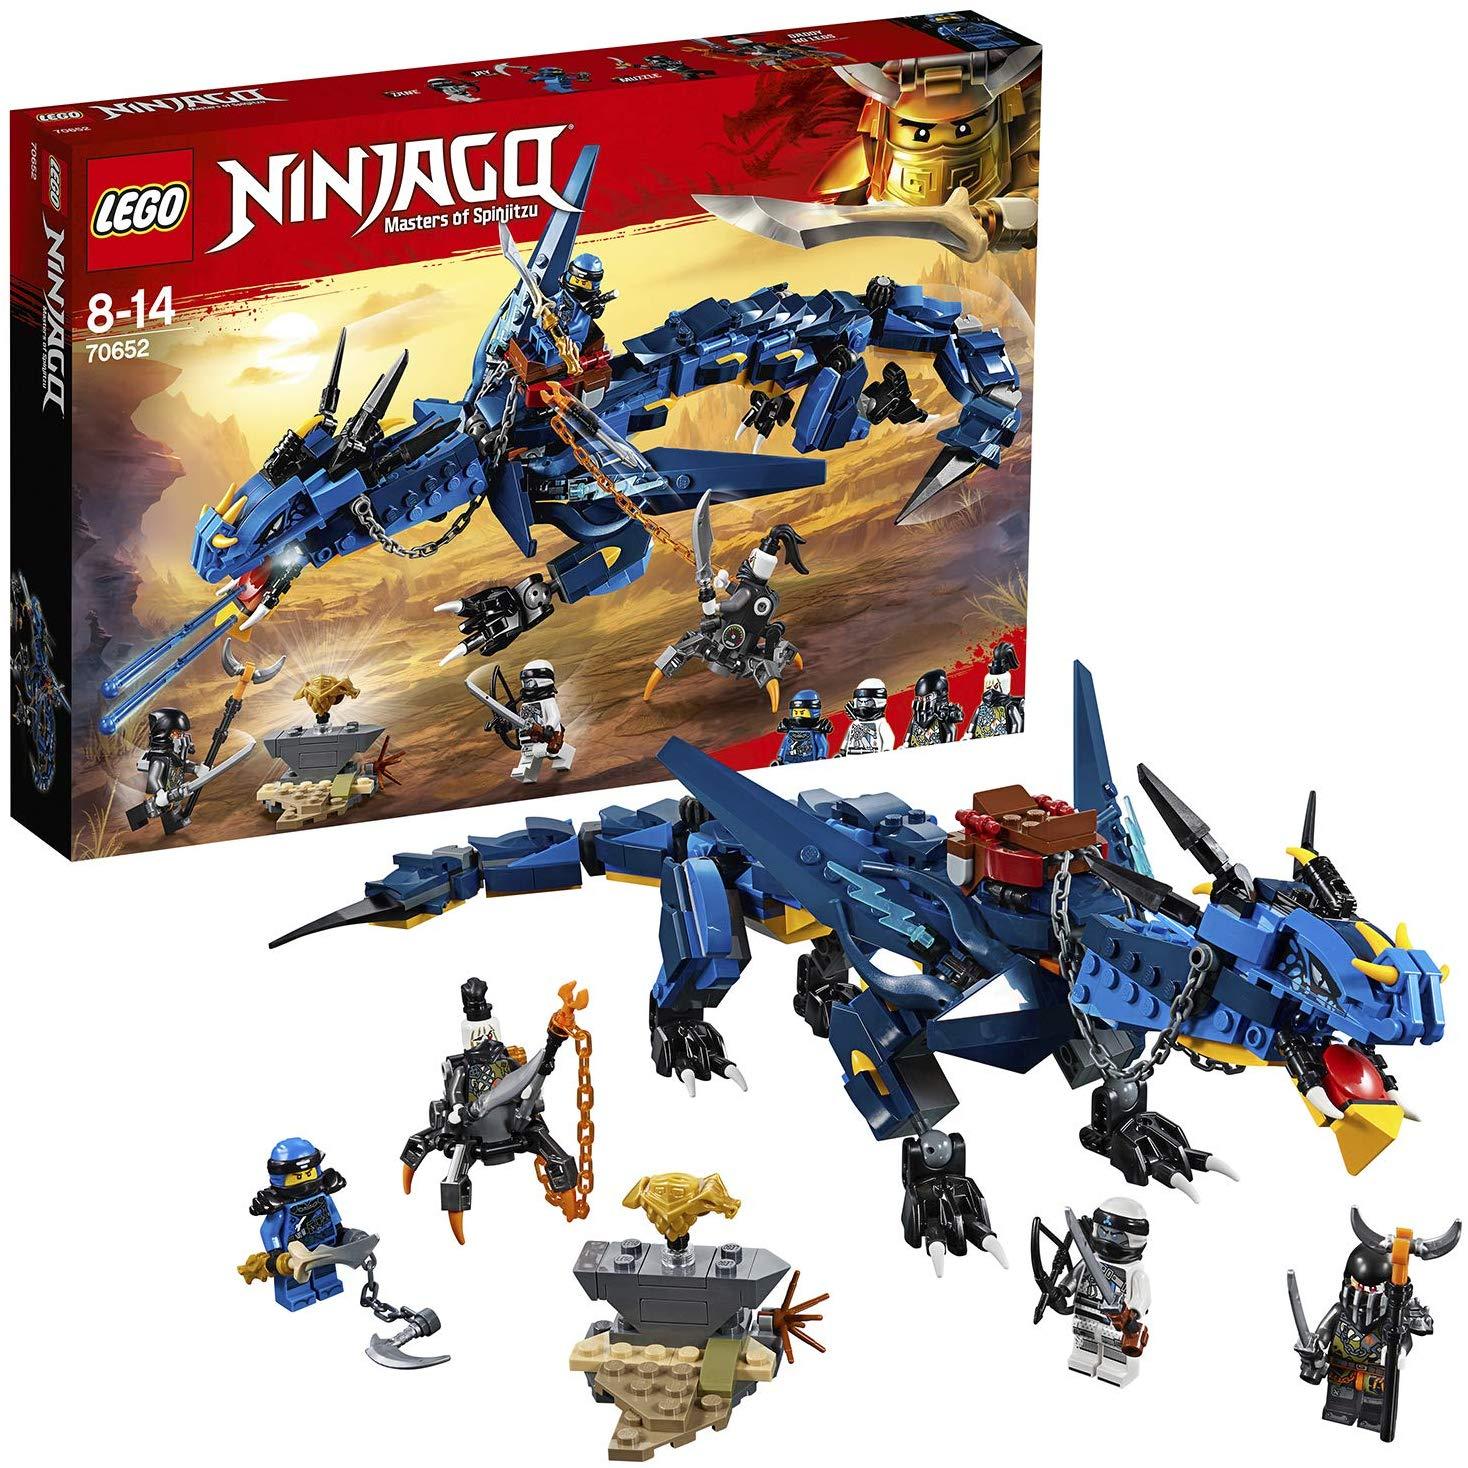 LEGO Ninjago - Le dragon Stormbringer (70652)